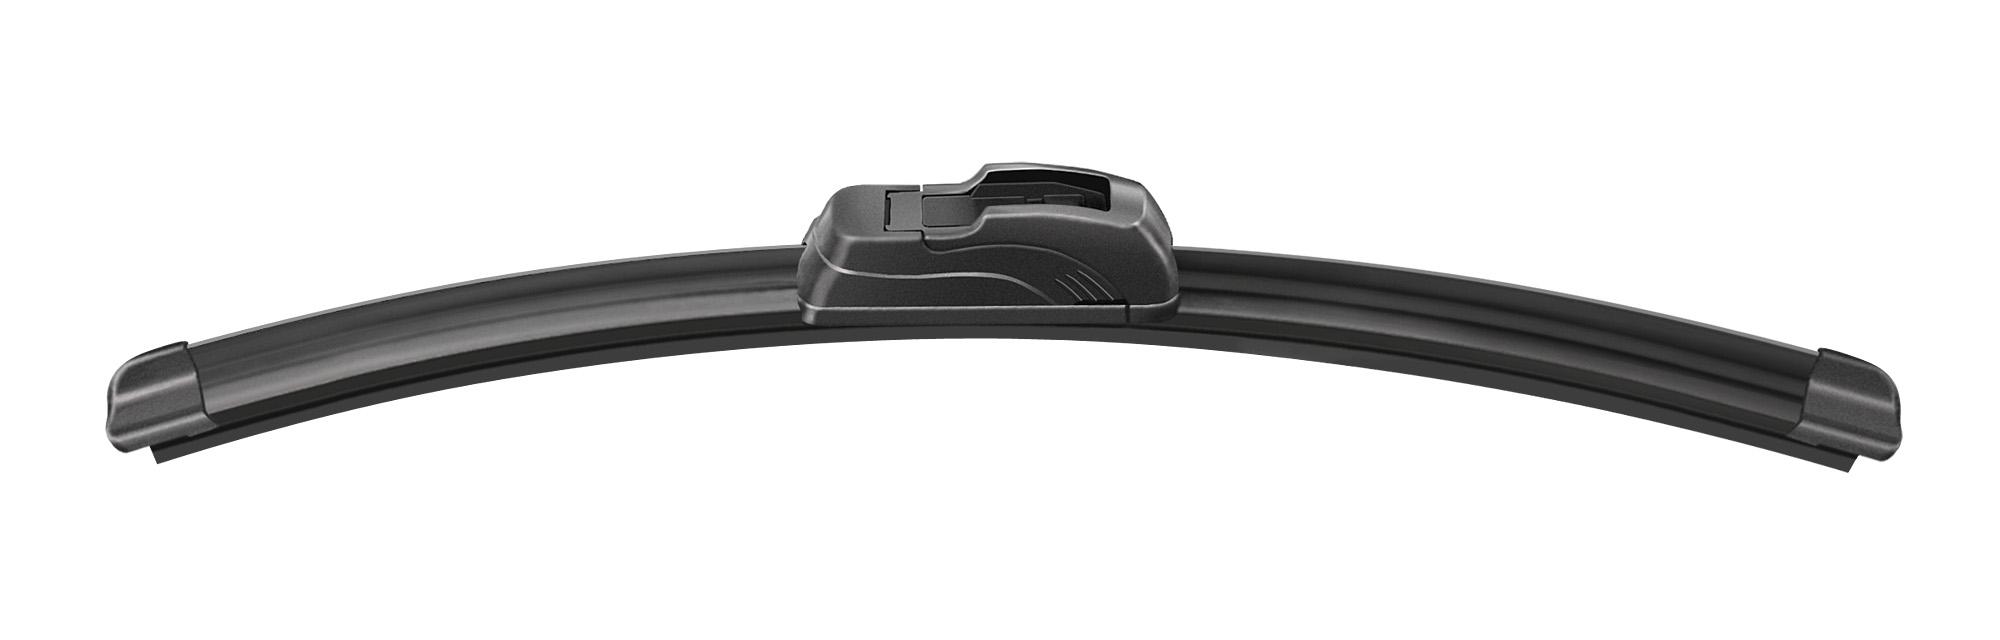 Lišta stěrače 700mm FLAT VALEO plochá kus